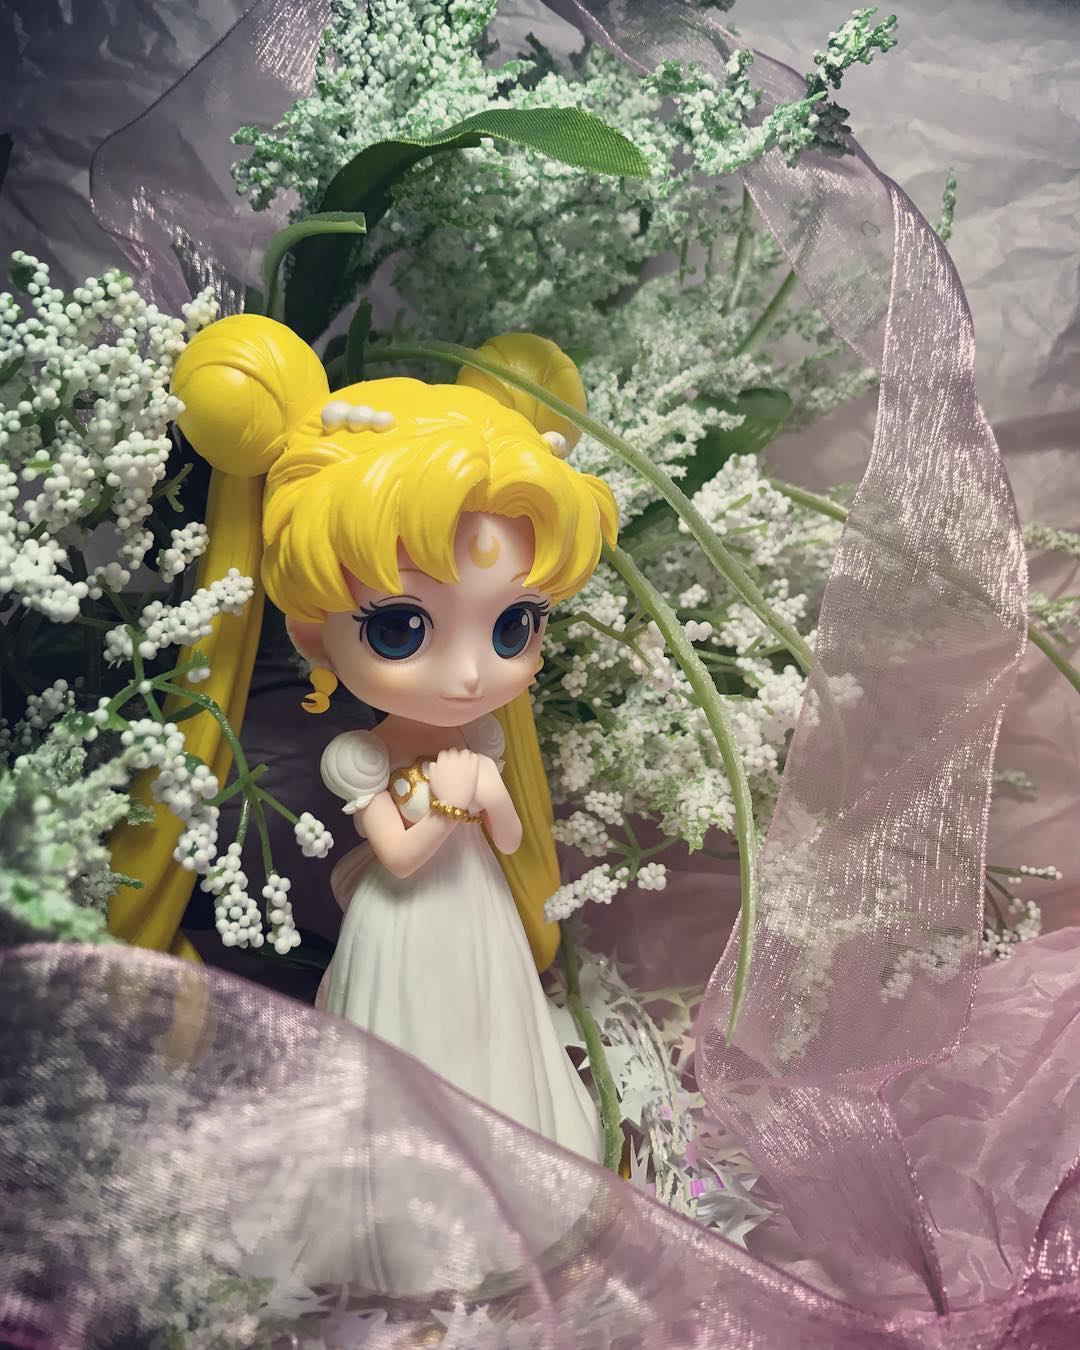 banpresto princess_serenity bishoujo_senshi_sailor_moon takeuchi_naoko girls_memories q_posket